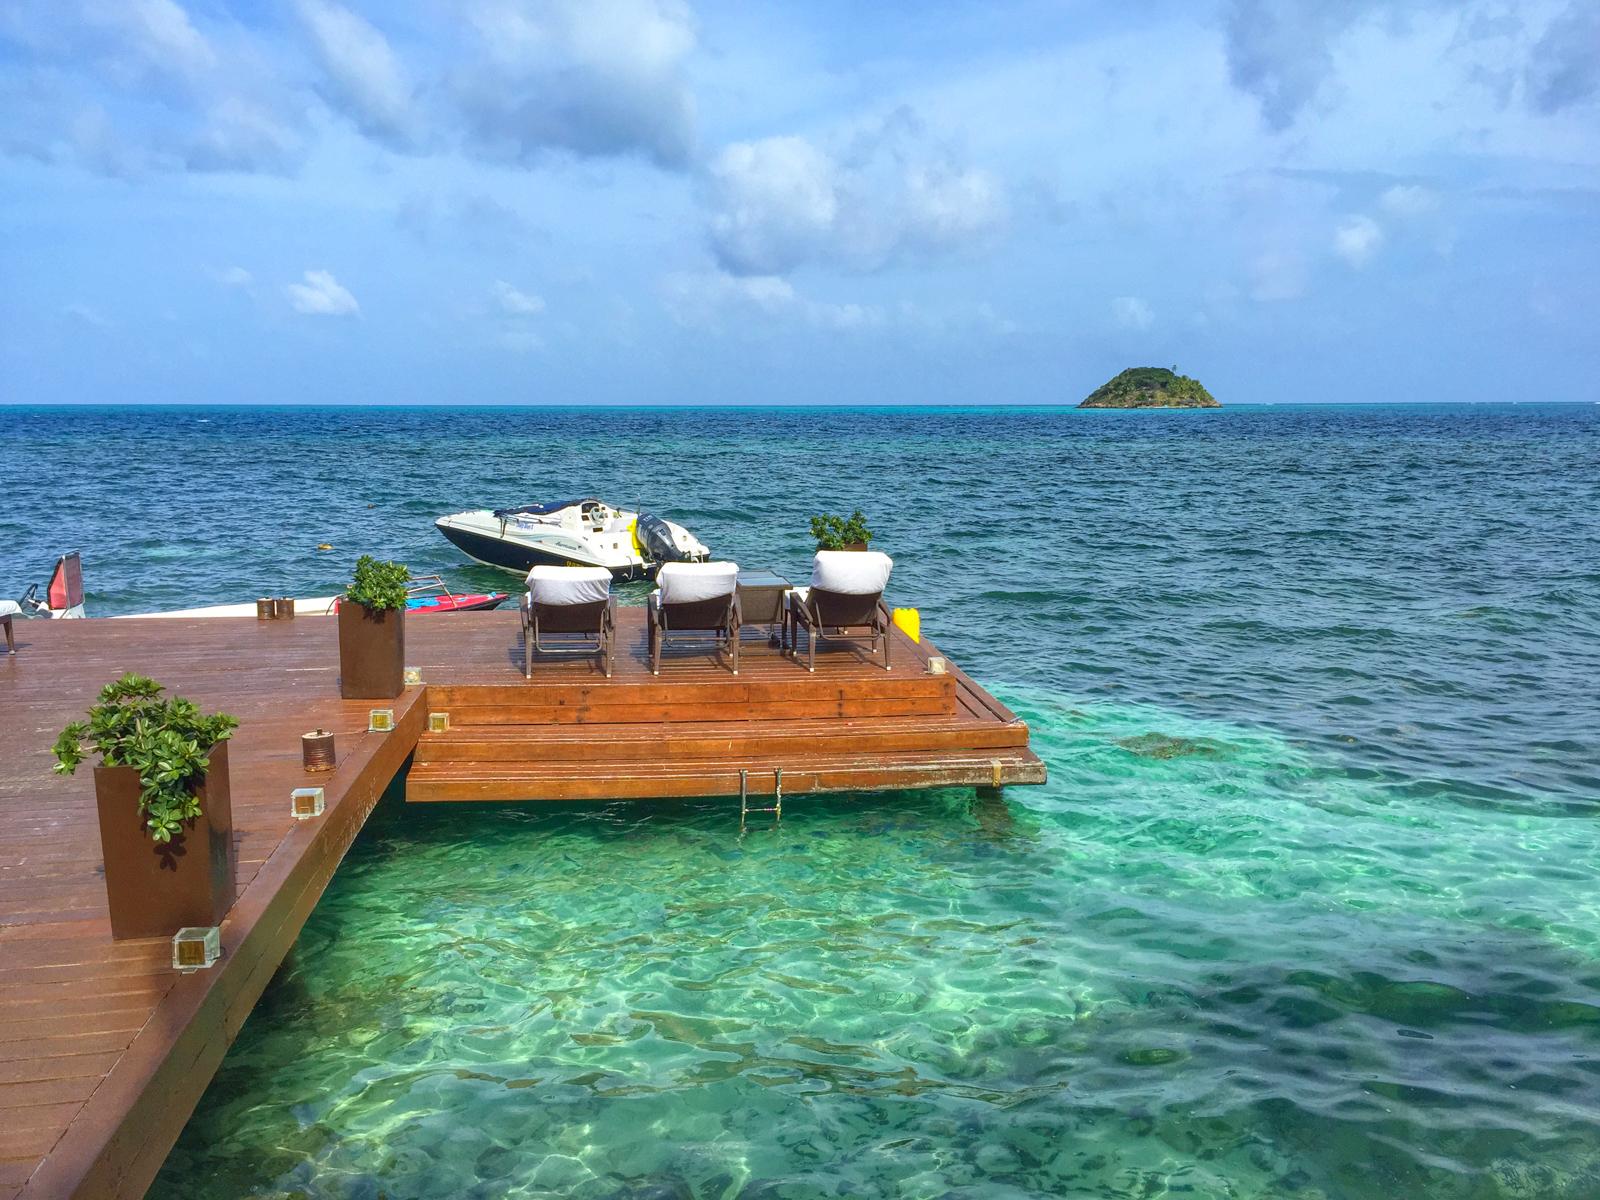 Deep Blue Hotel dock